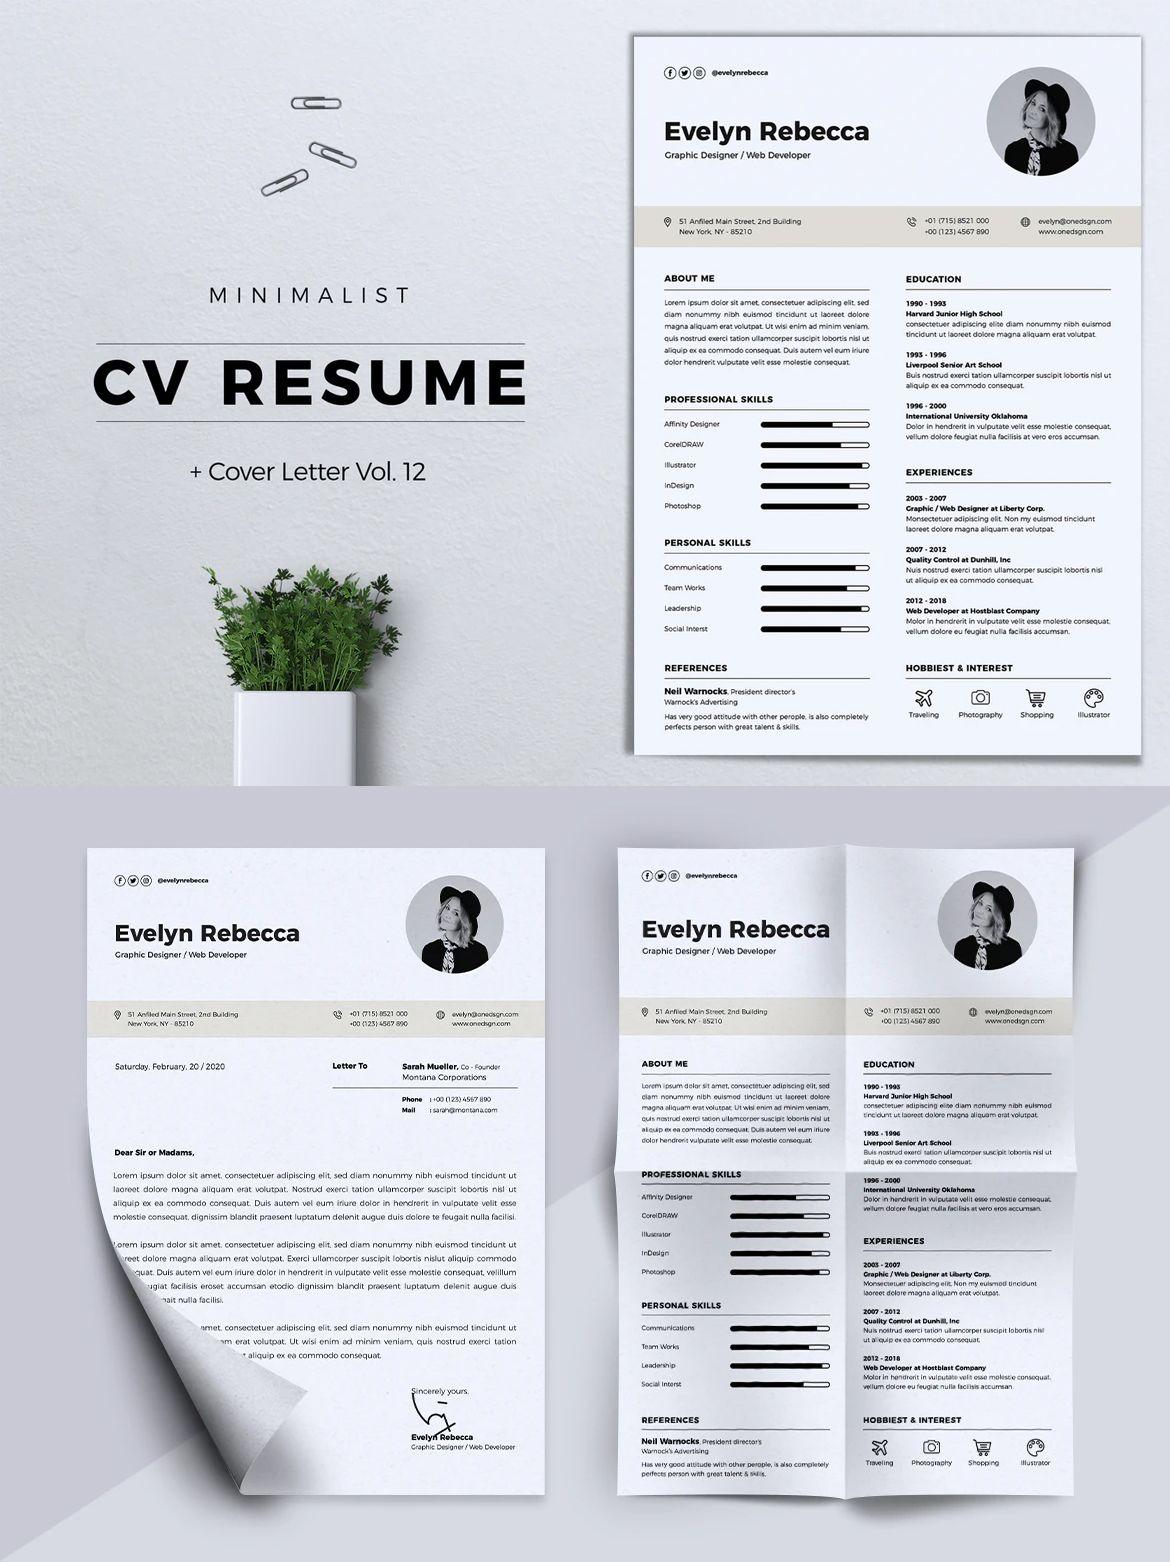 Minimalist CV Resume Template AI, EPS, PSD A4 format